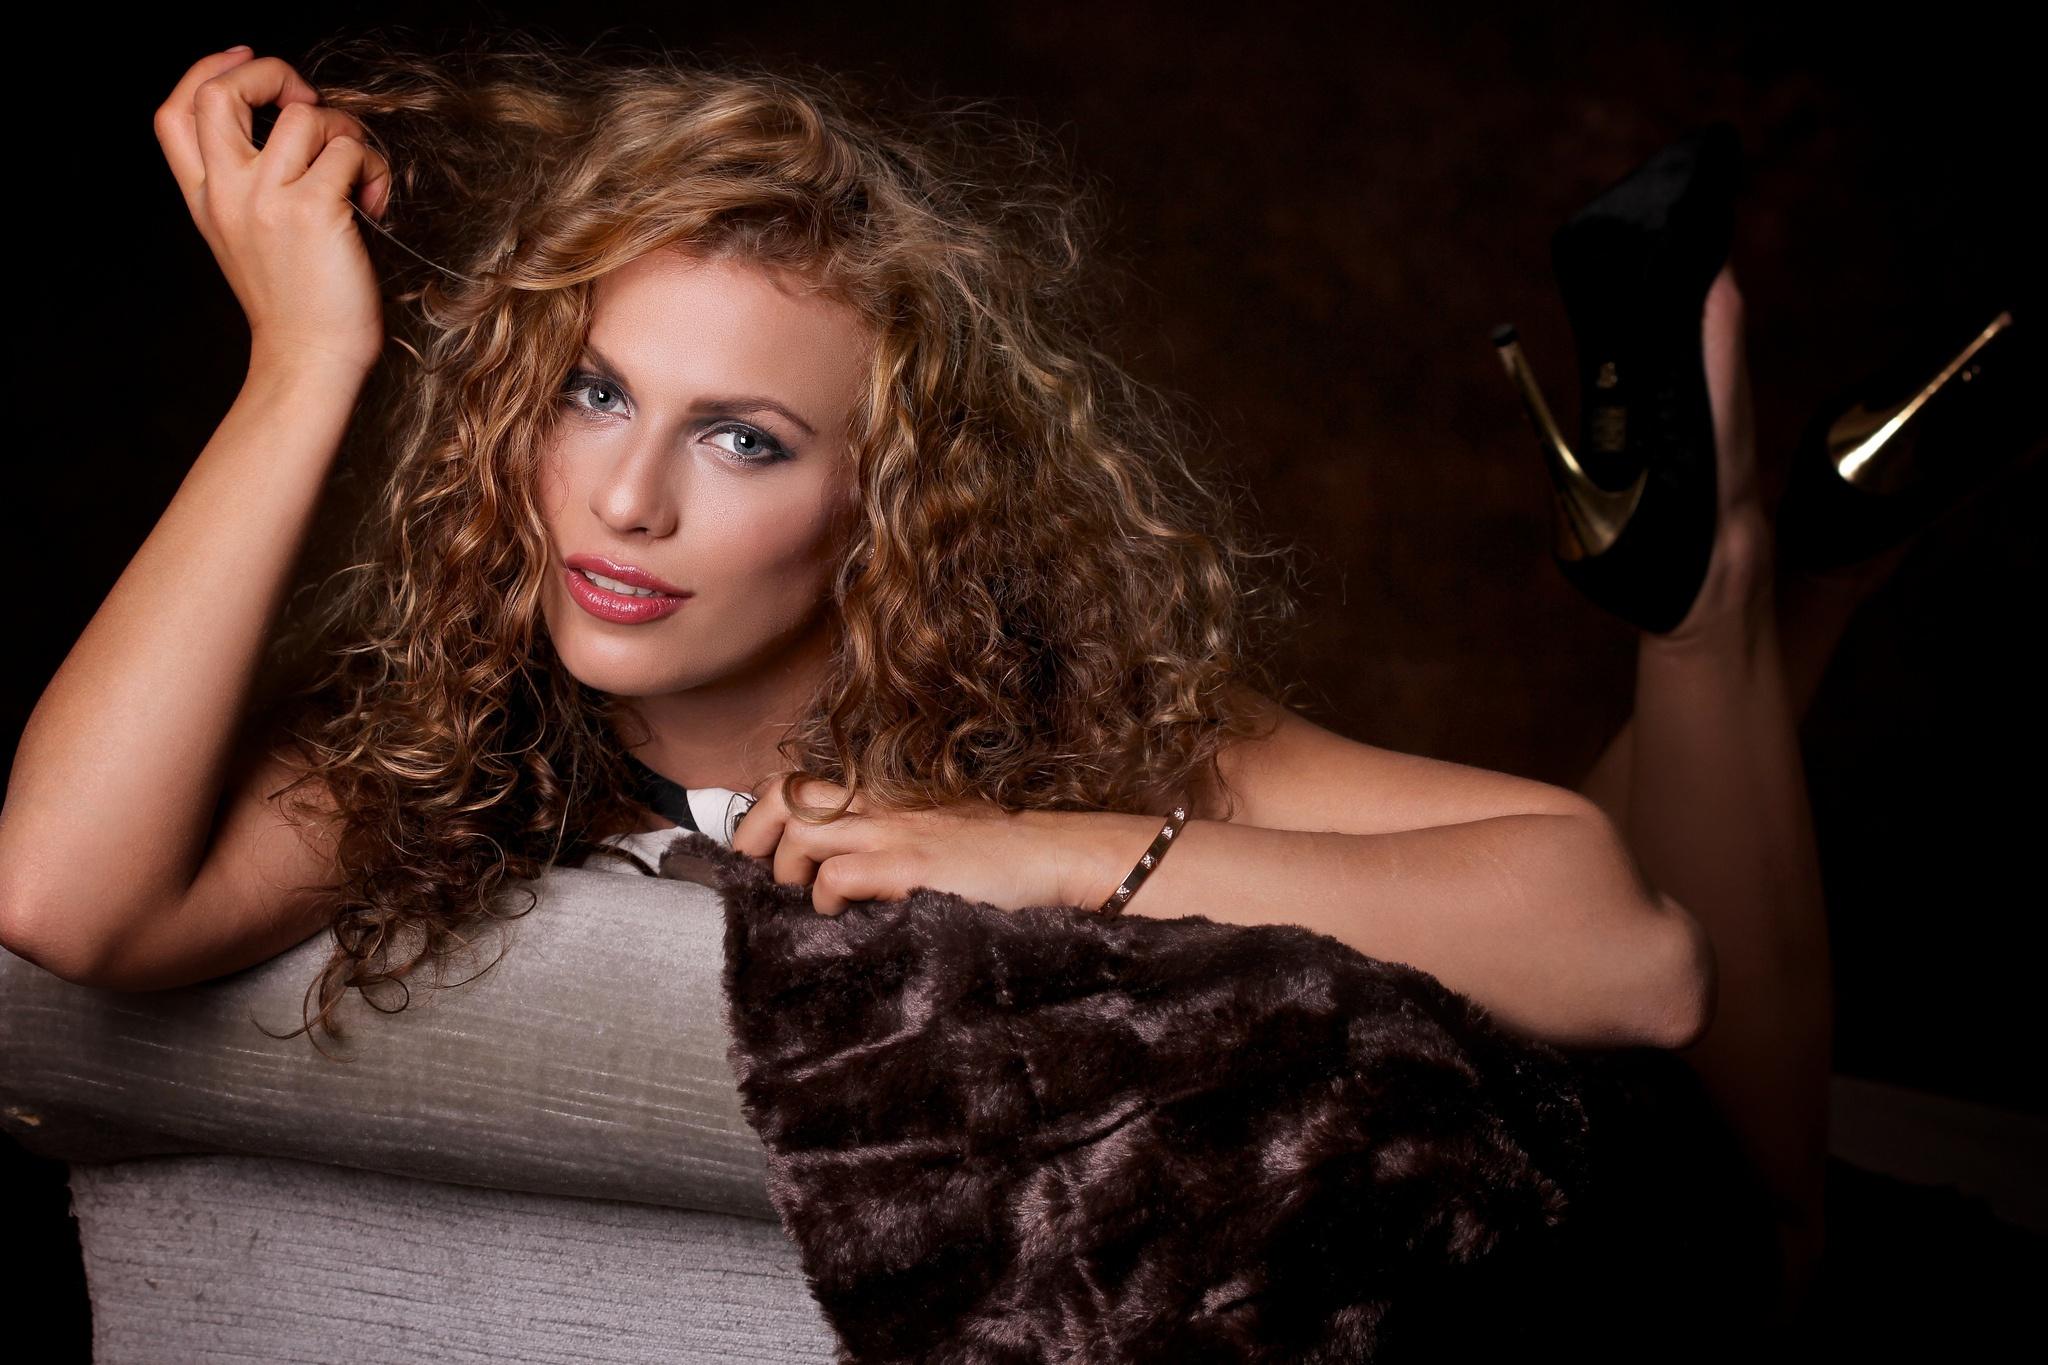 women, Long Hair, Brunette, Looking At Viewer, Curly Hair